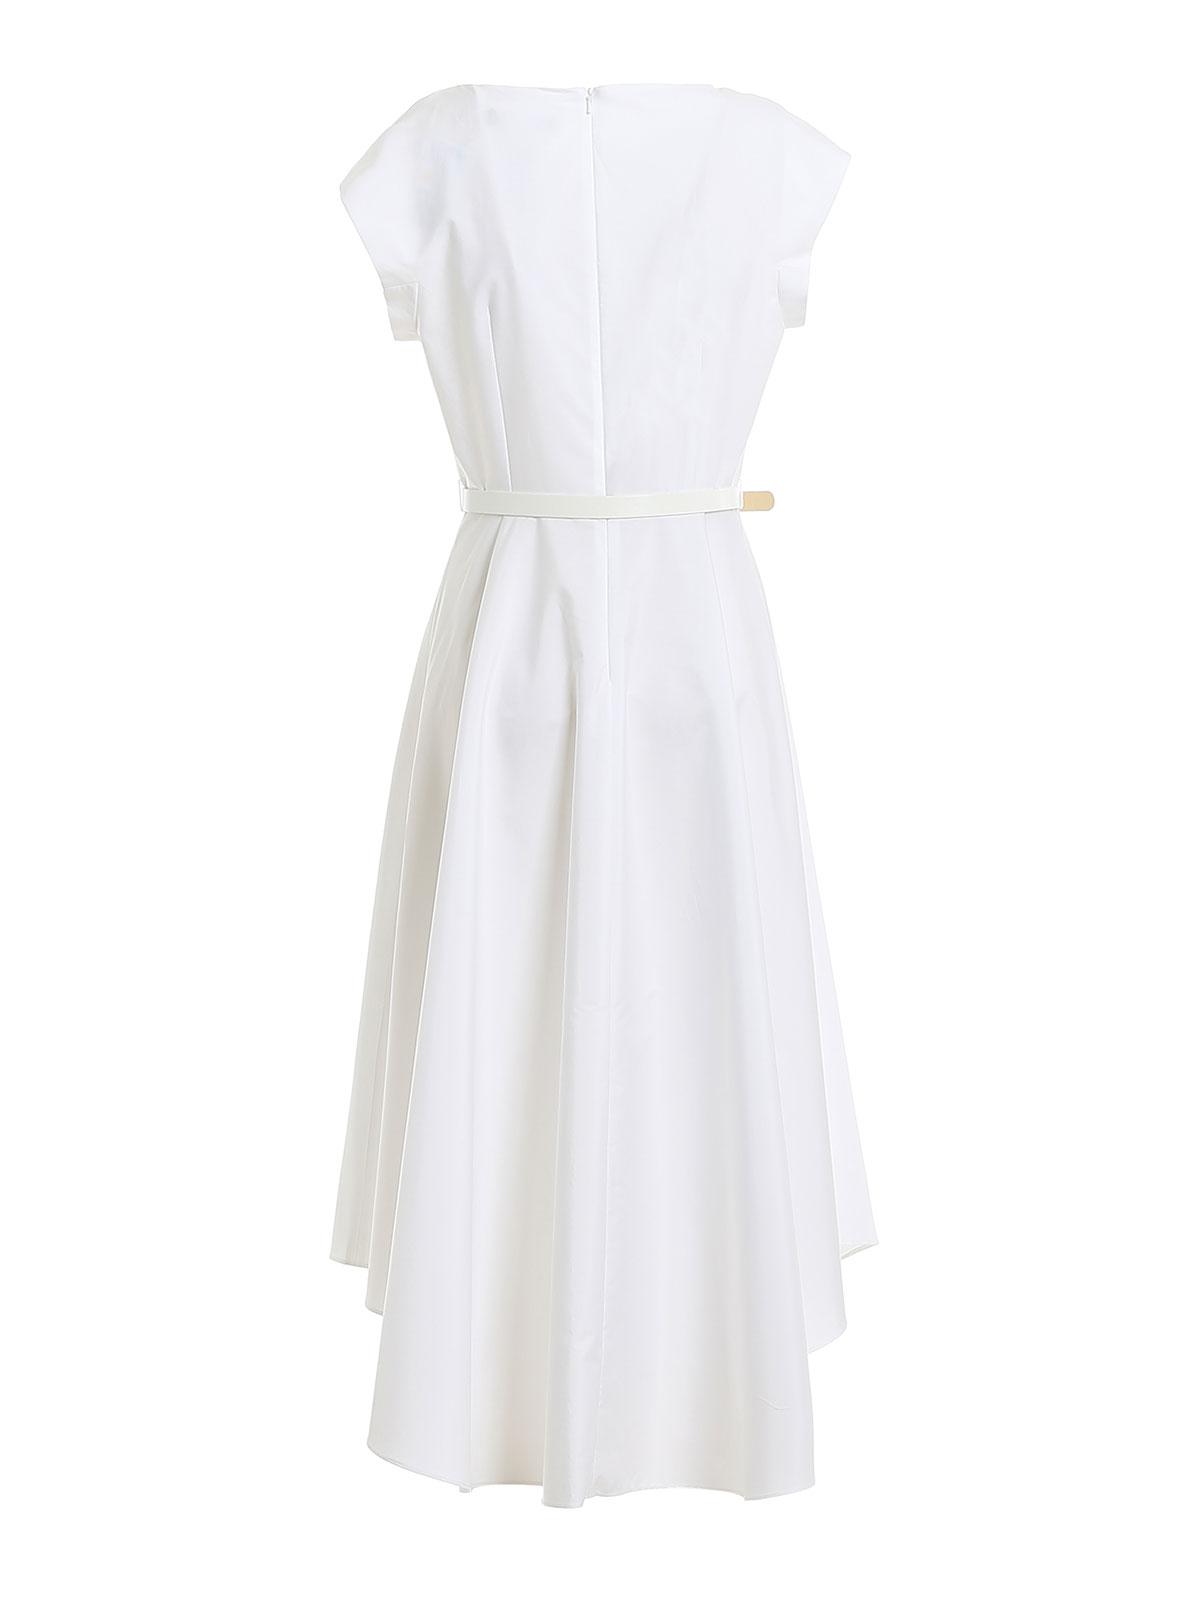 Knielanges Kleid - WeiSs